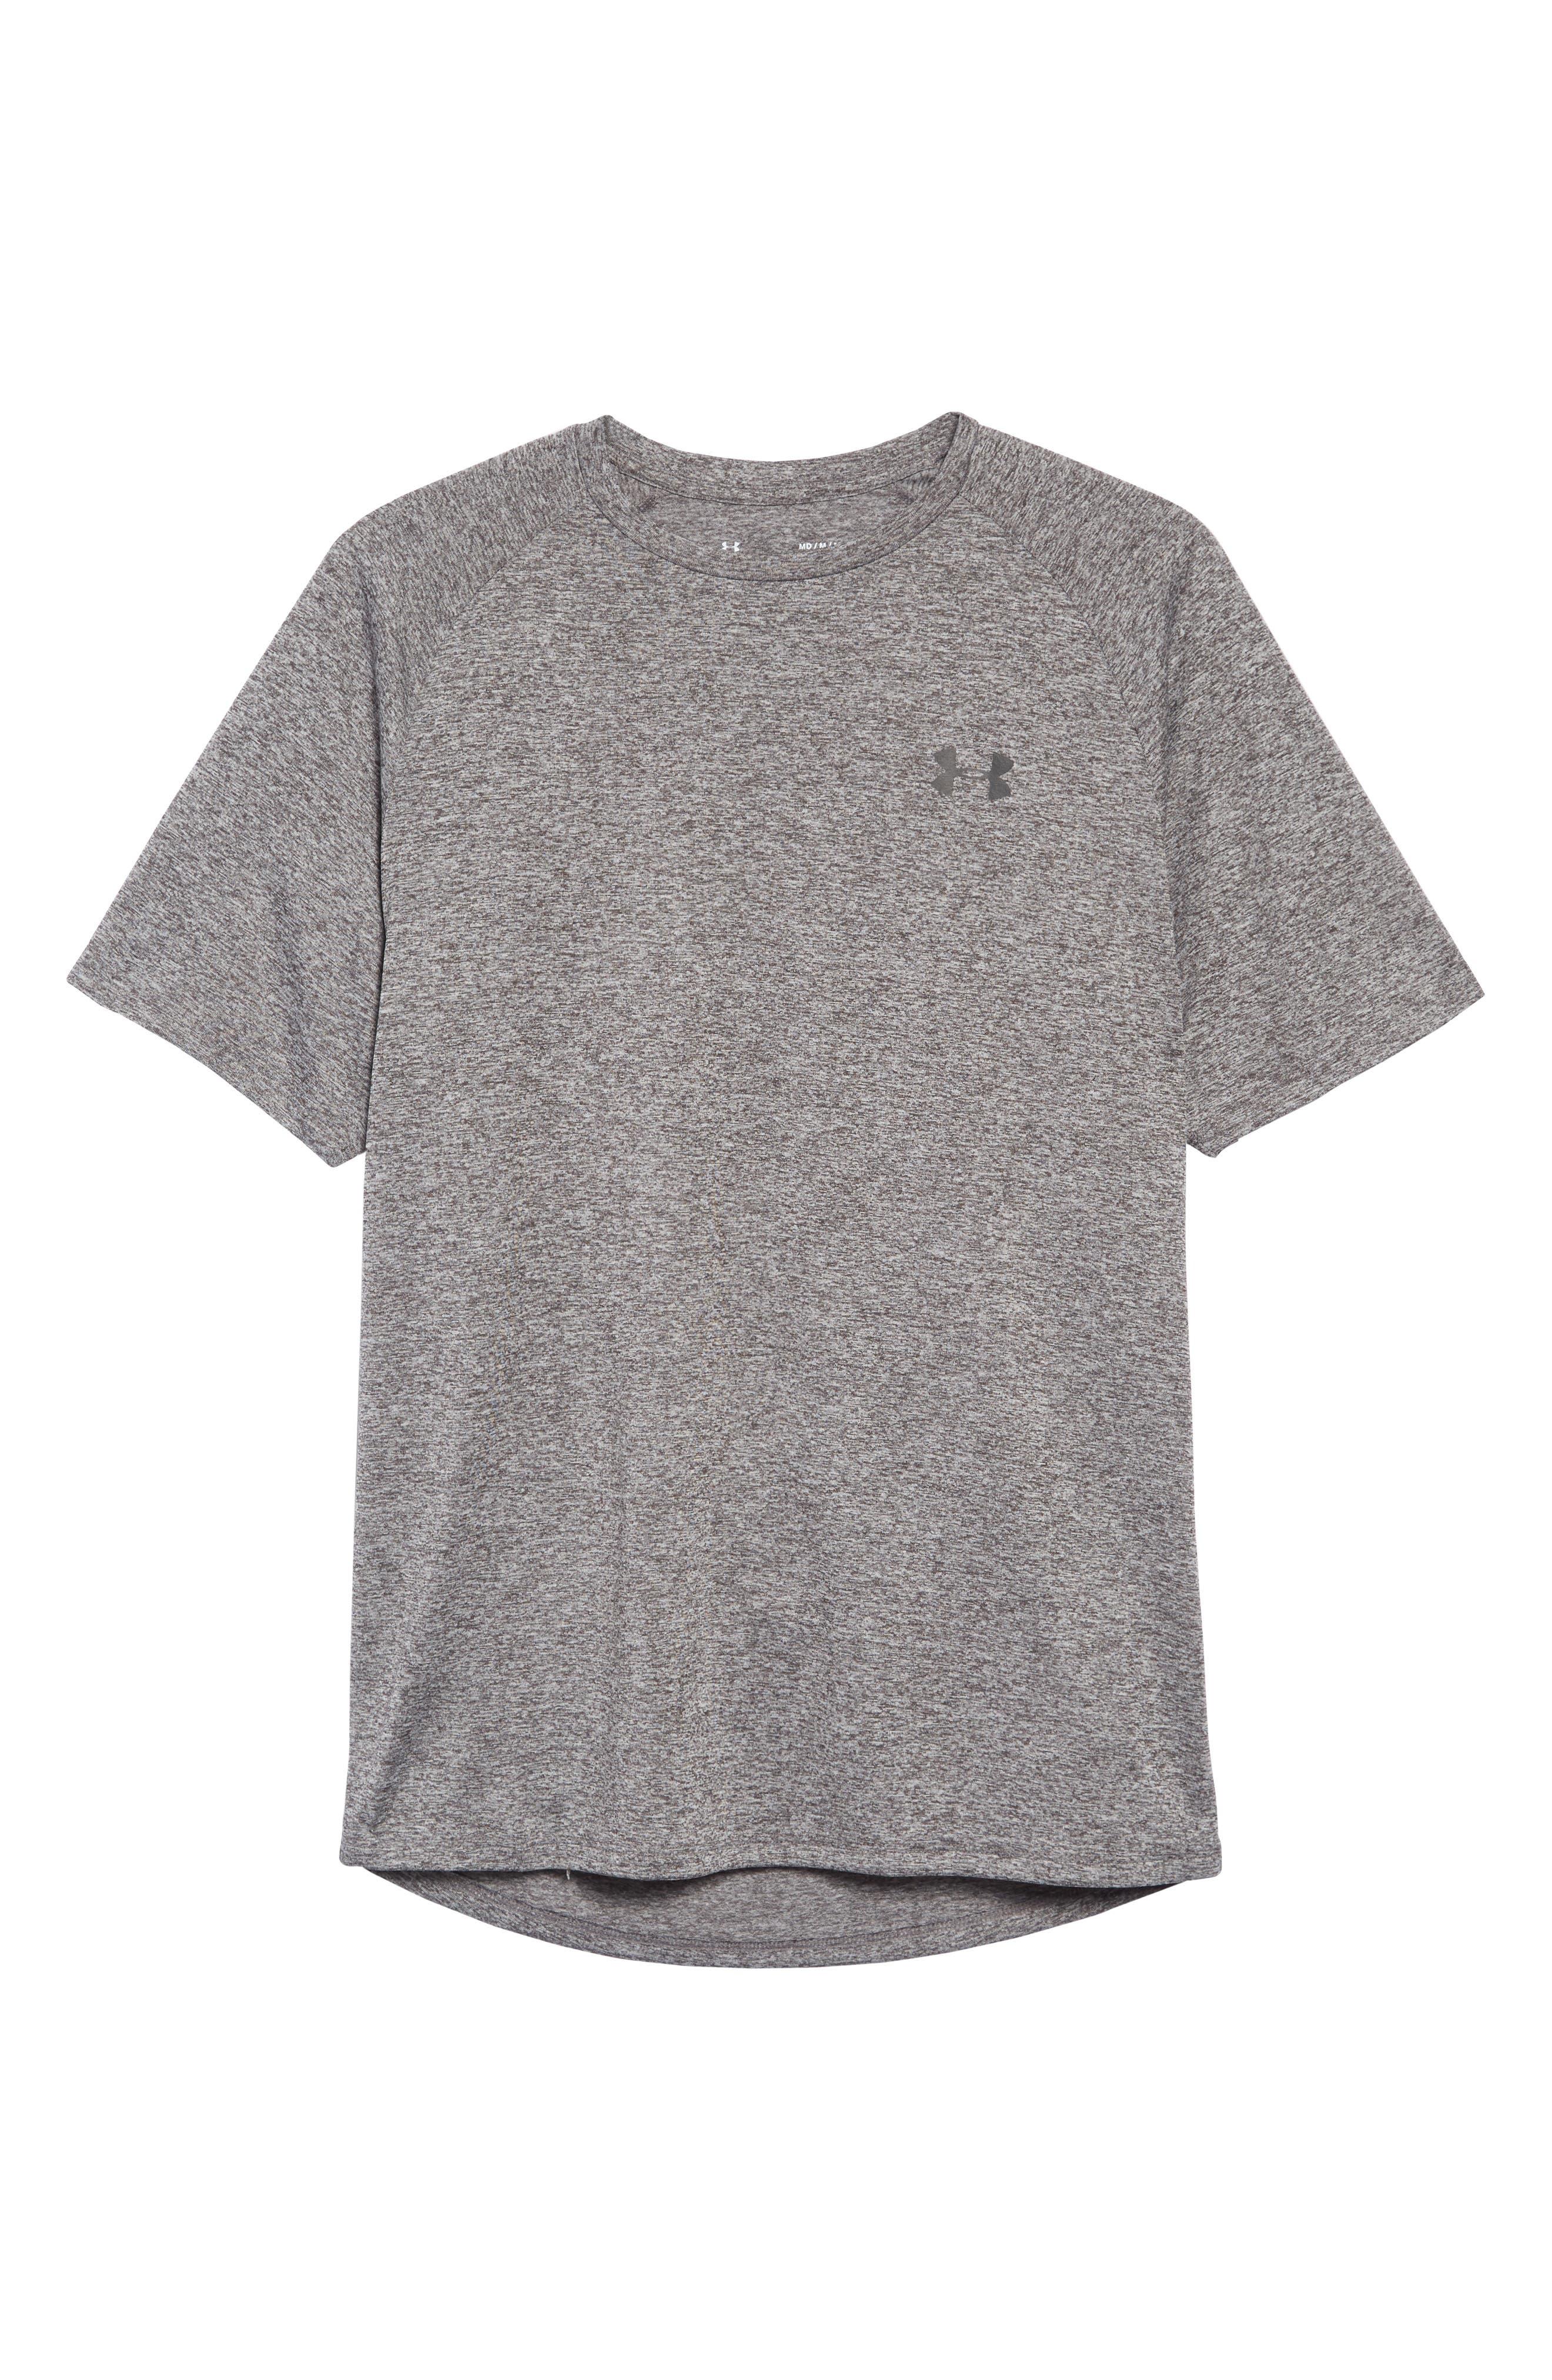 UA Tech<sup>™</sup> T-Shirt,                             Alternate thumbnail 6, color,                             CHARCOAL LIGHT HEATHER